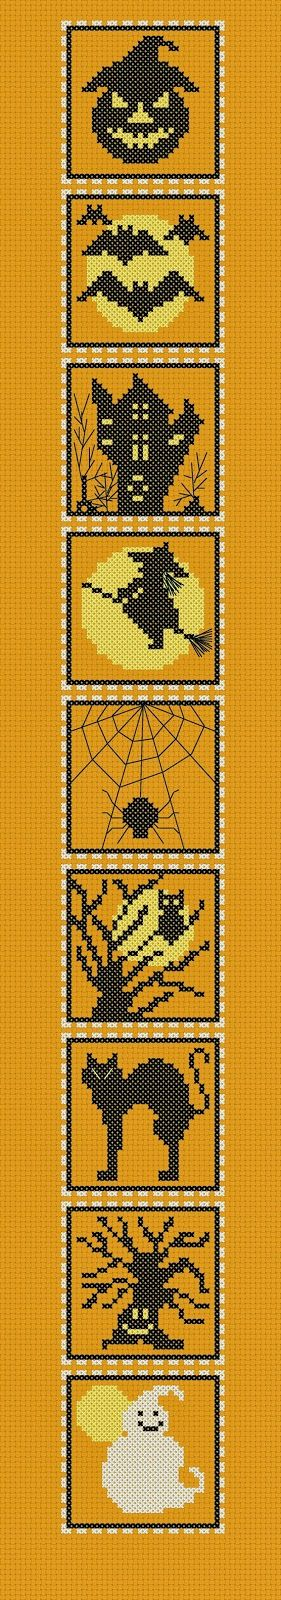 Stickeule: Halloween